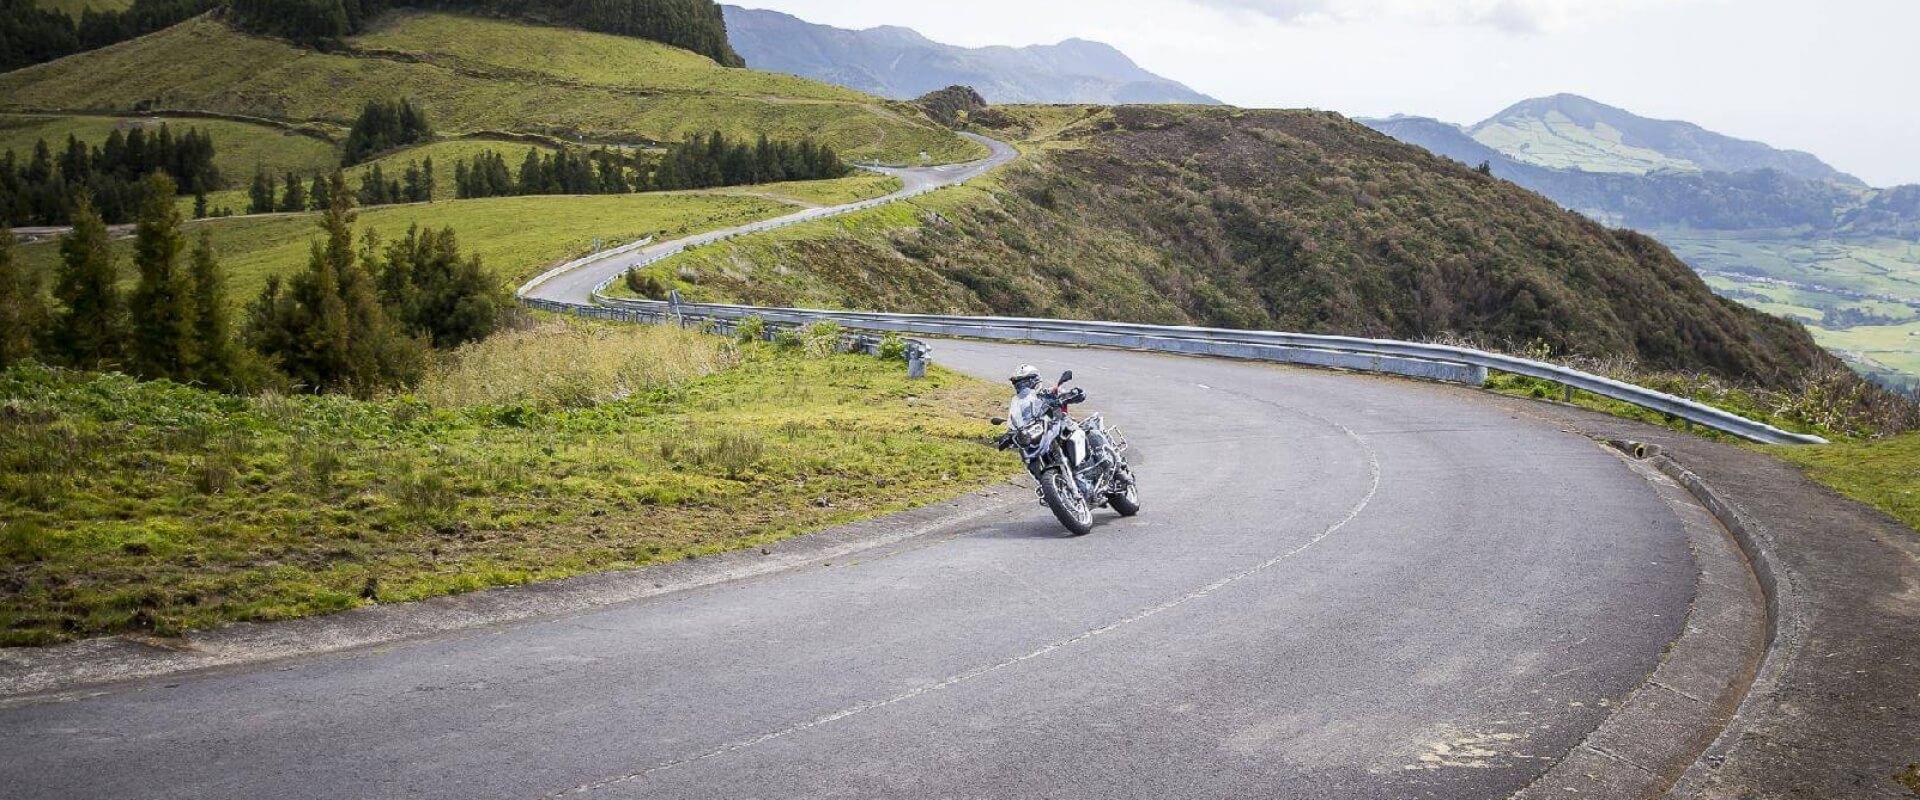 Tour in moto Azzorre